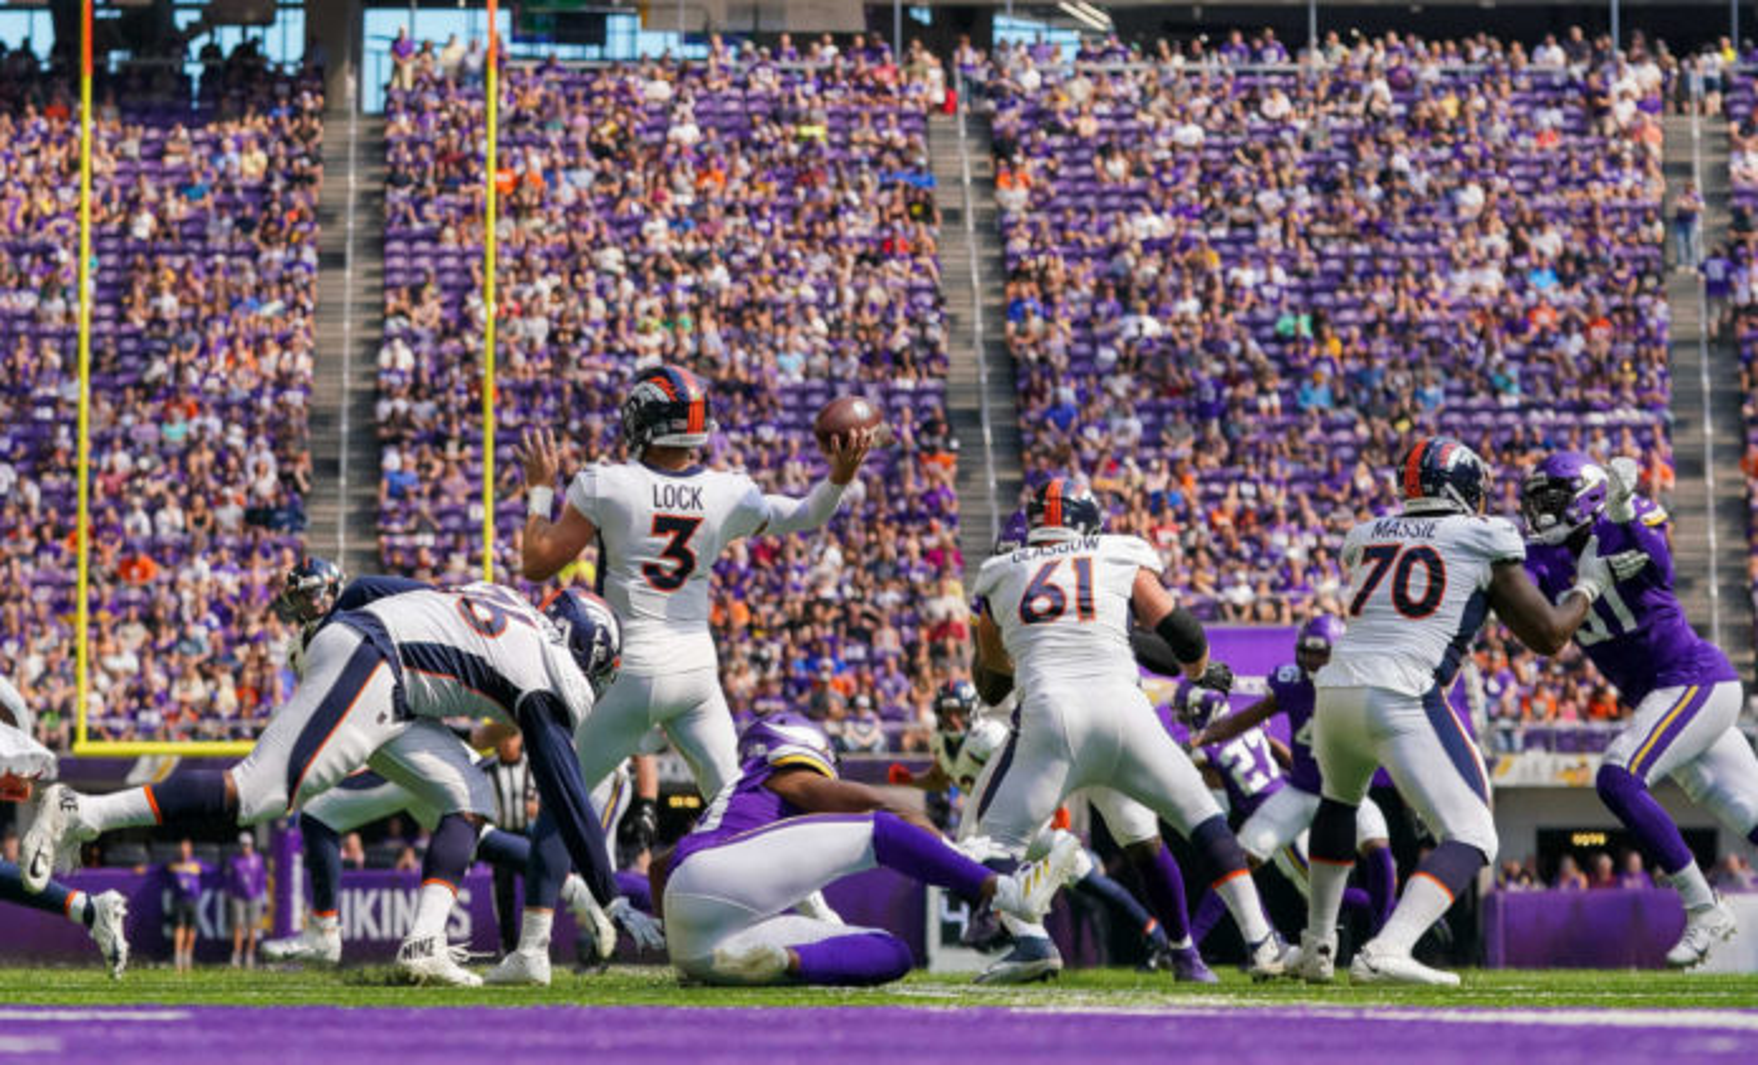 Denver Broncos quarterback Drew Lock (3) passes against the Minnesota Vikings in the first quarter at U.S. Bank Stadium.